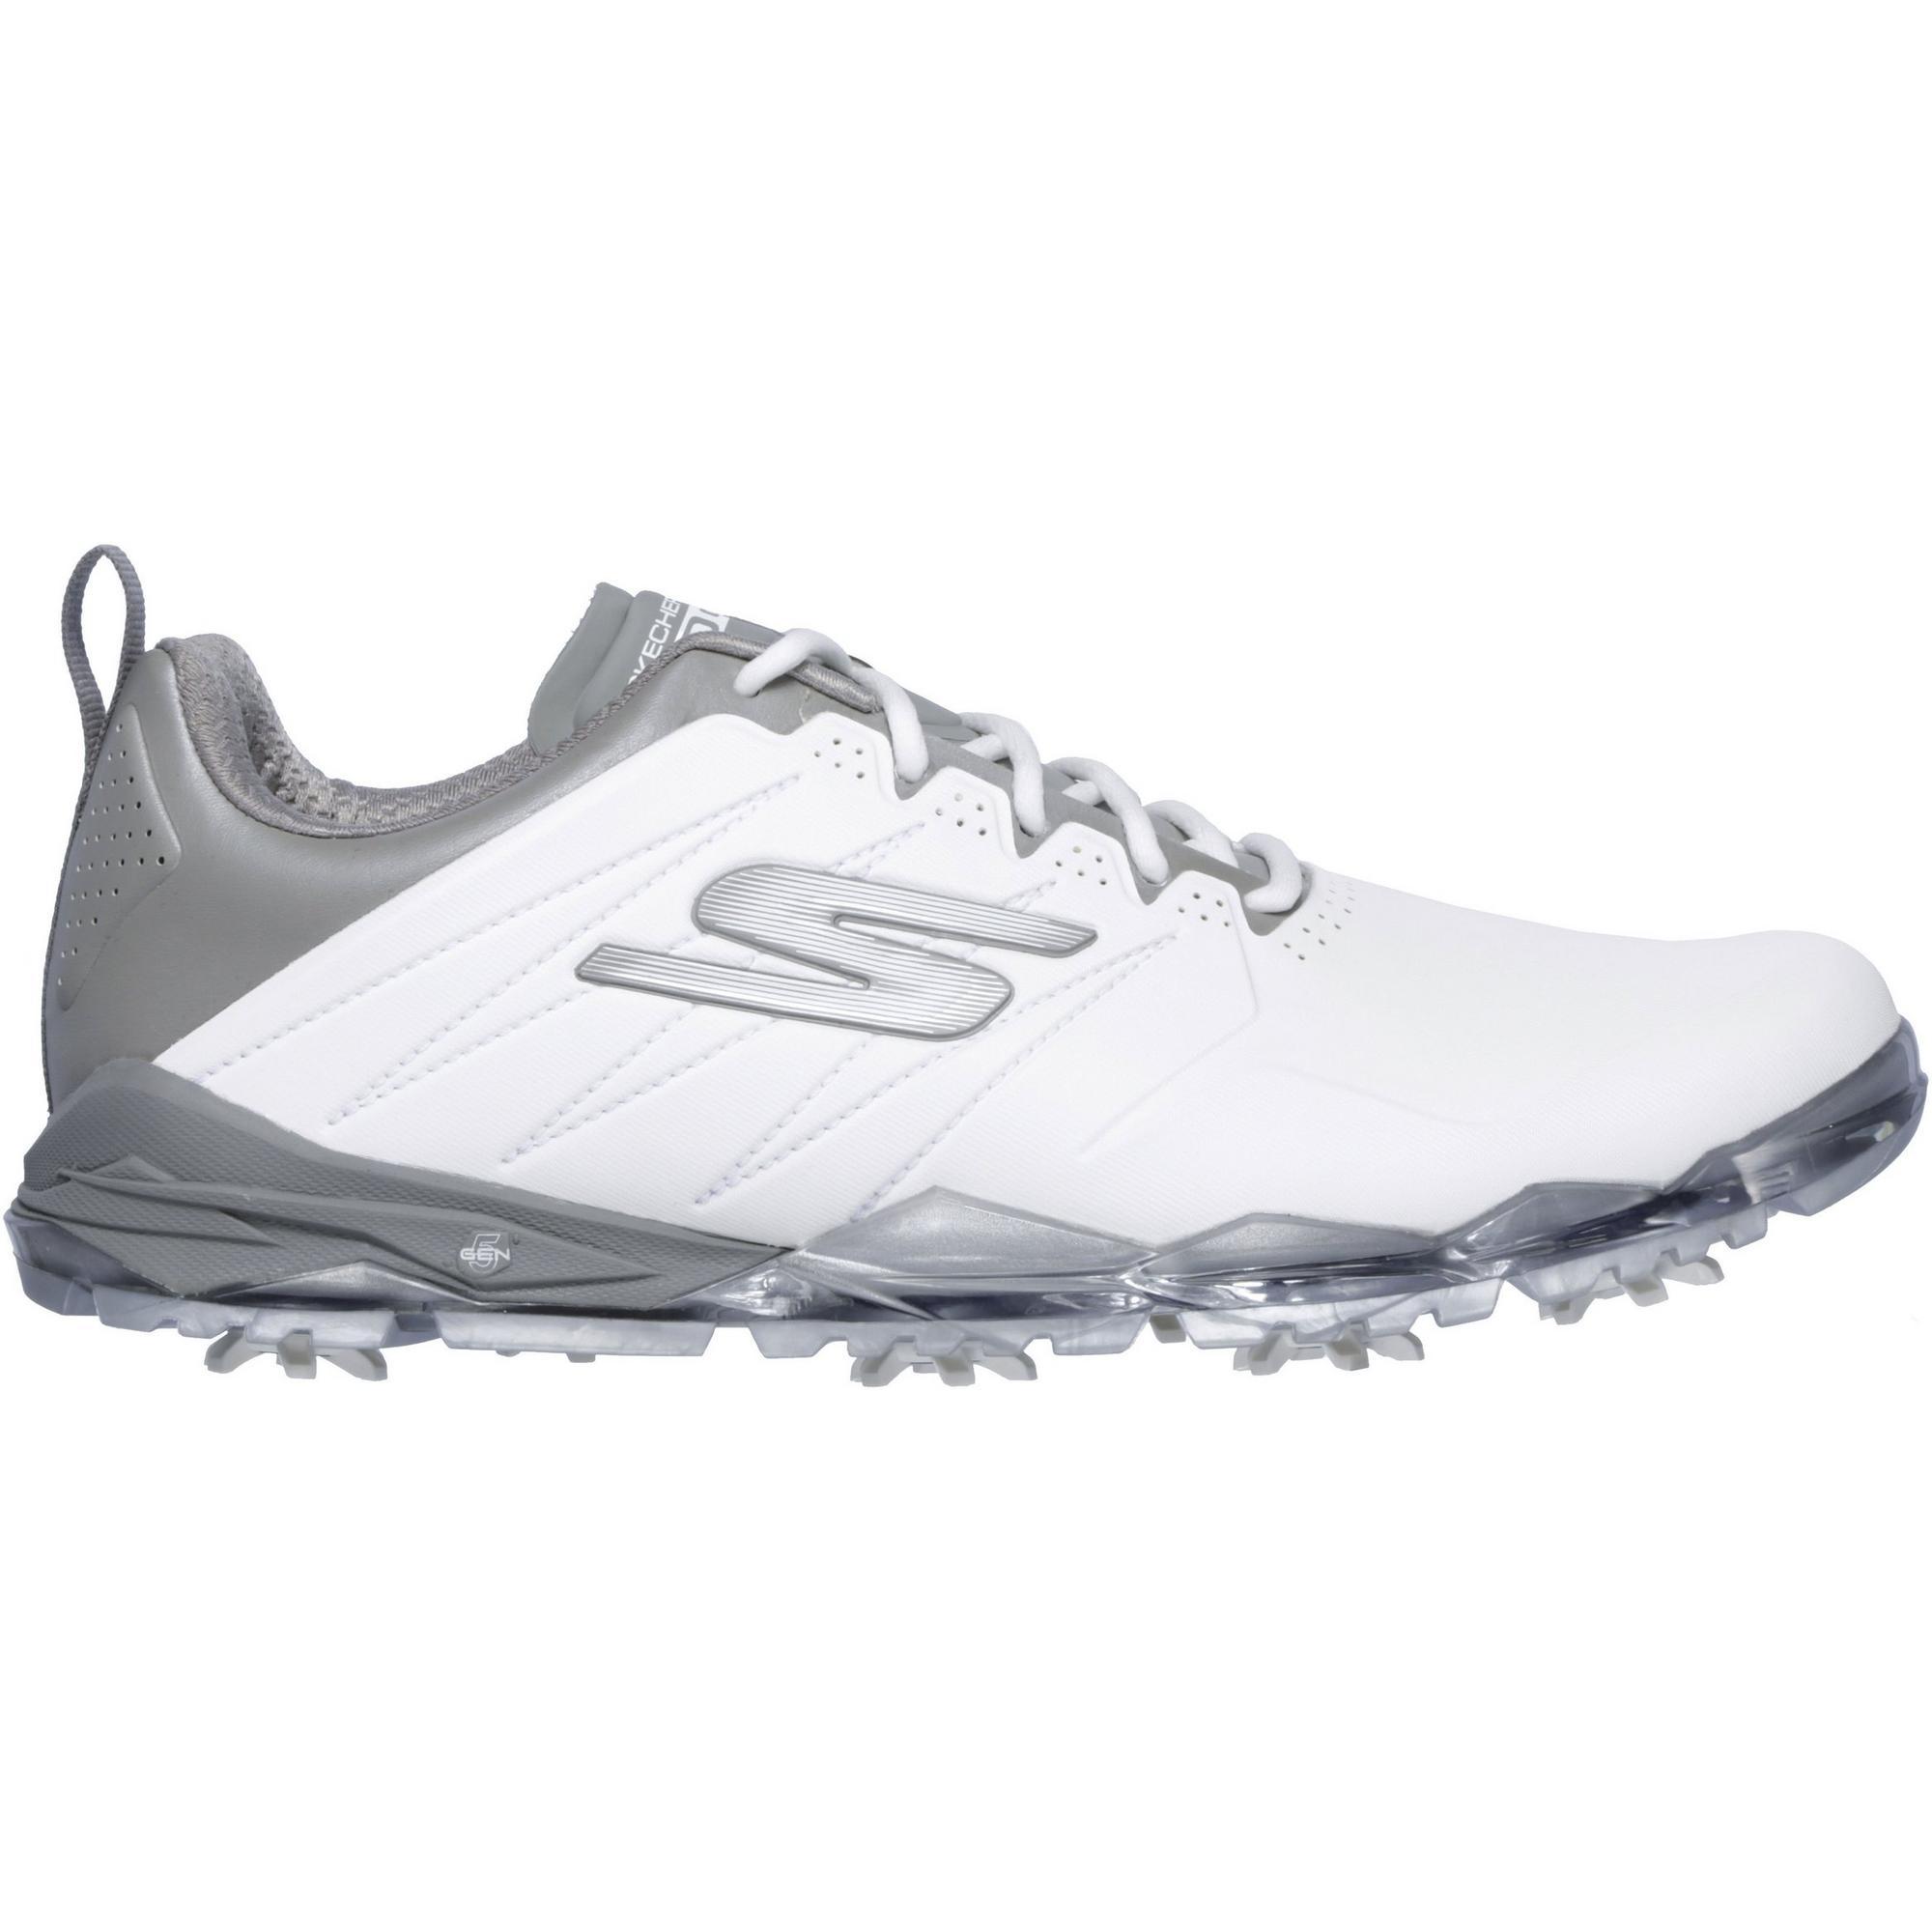 Men's Go Golf Focus 2 Spiked Golf Shoe - WHT/GRY